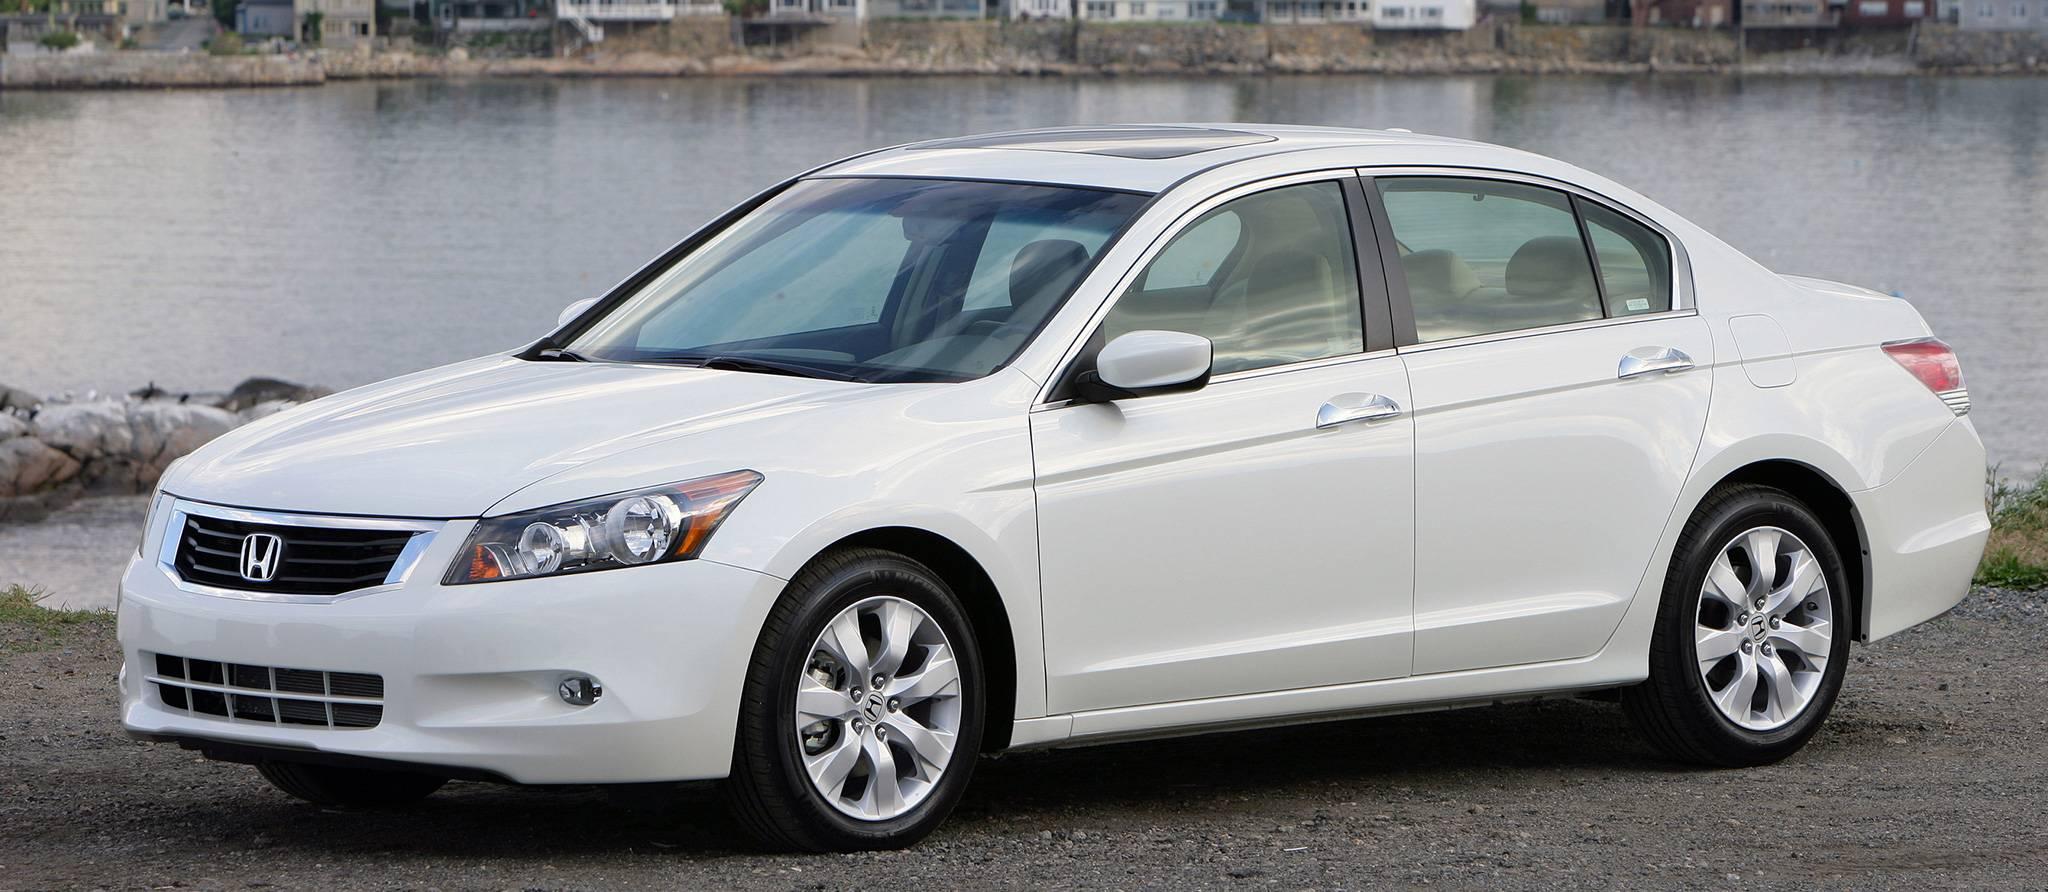 2010-Honda-Accord-2